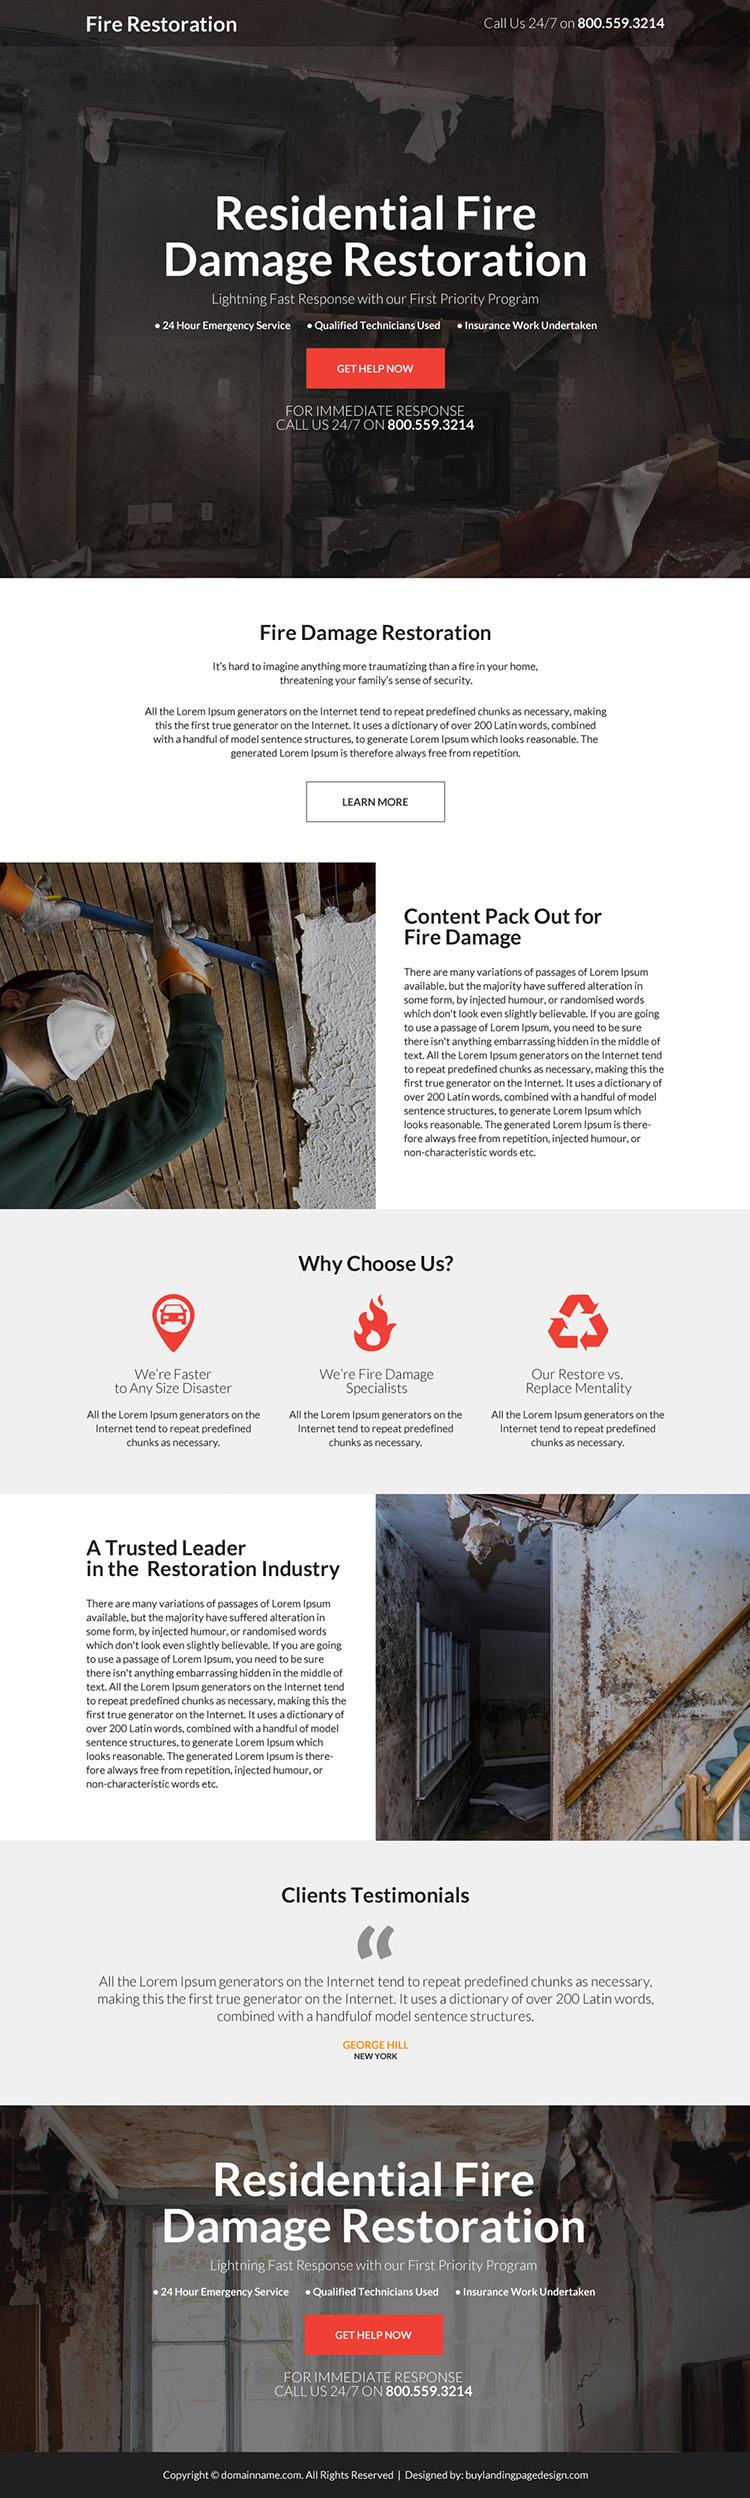 residential fire damage restoration landing page